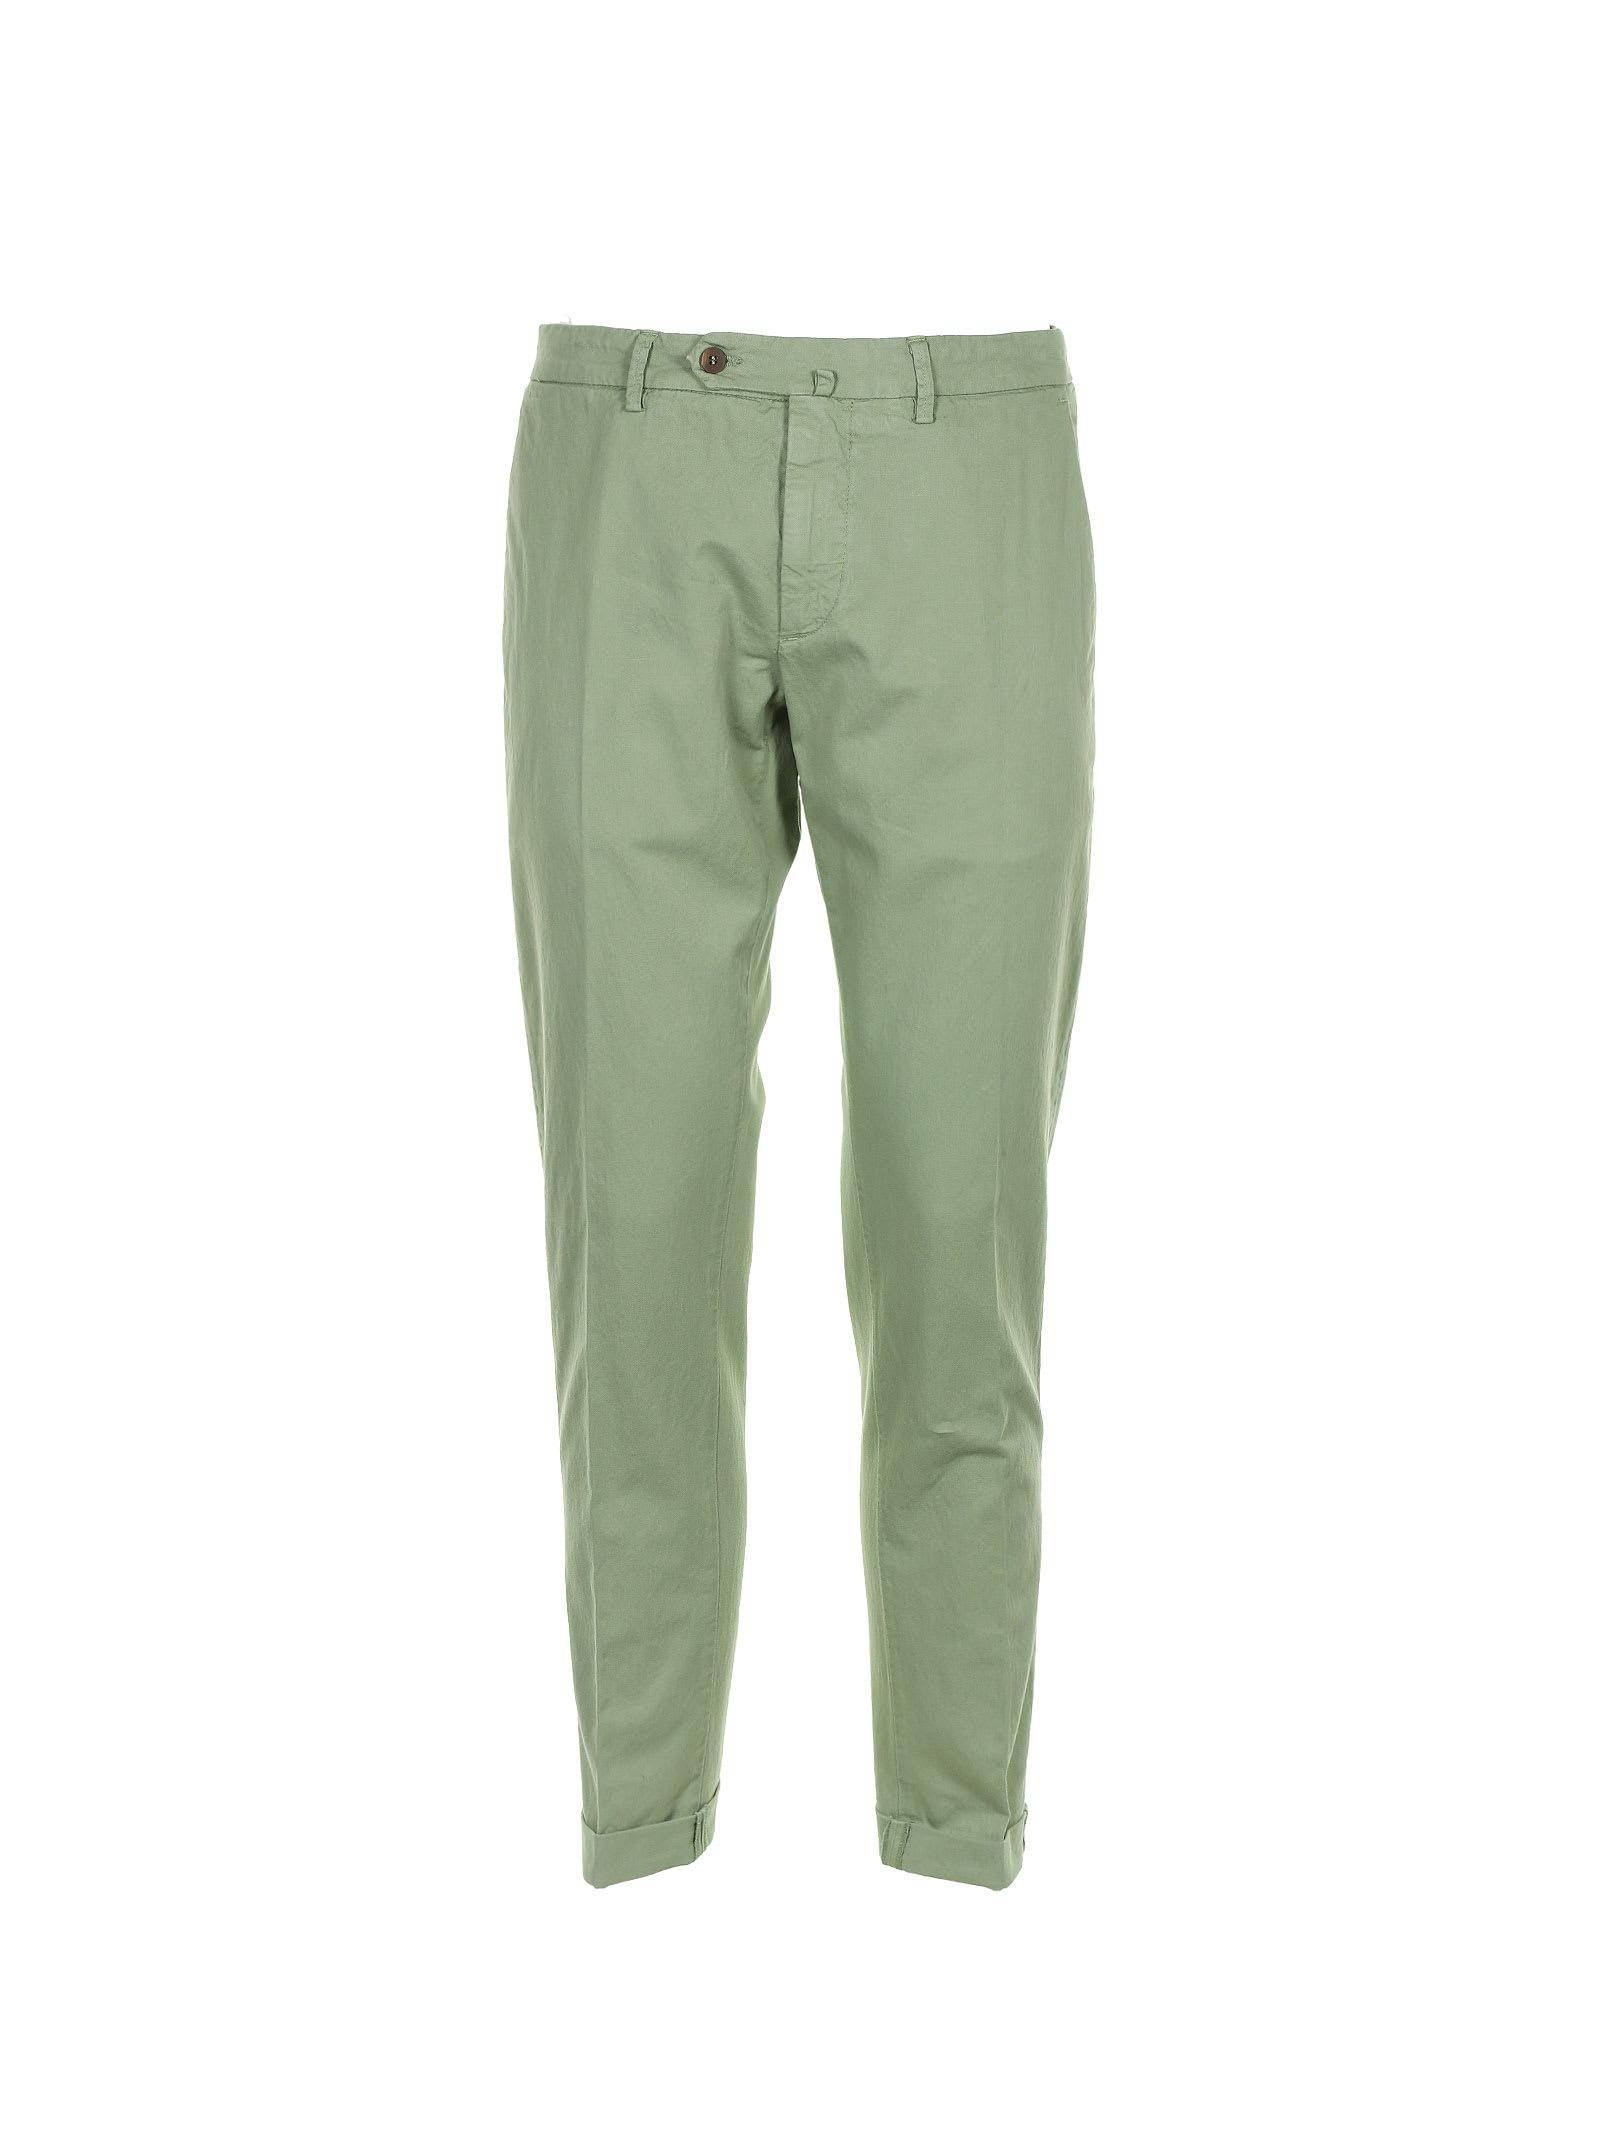 Siviglia Pants